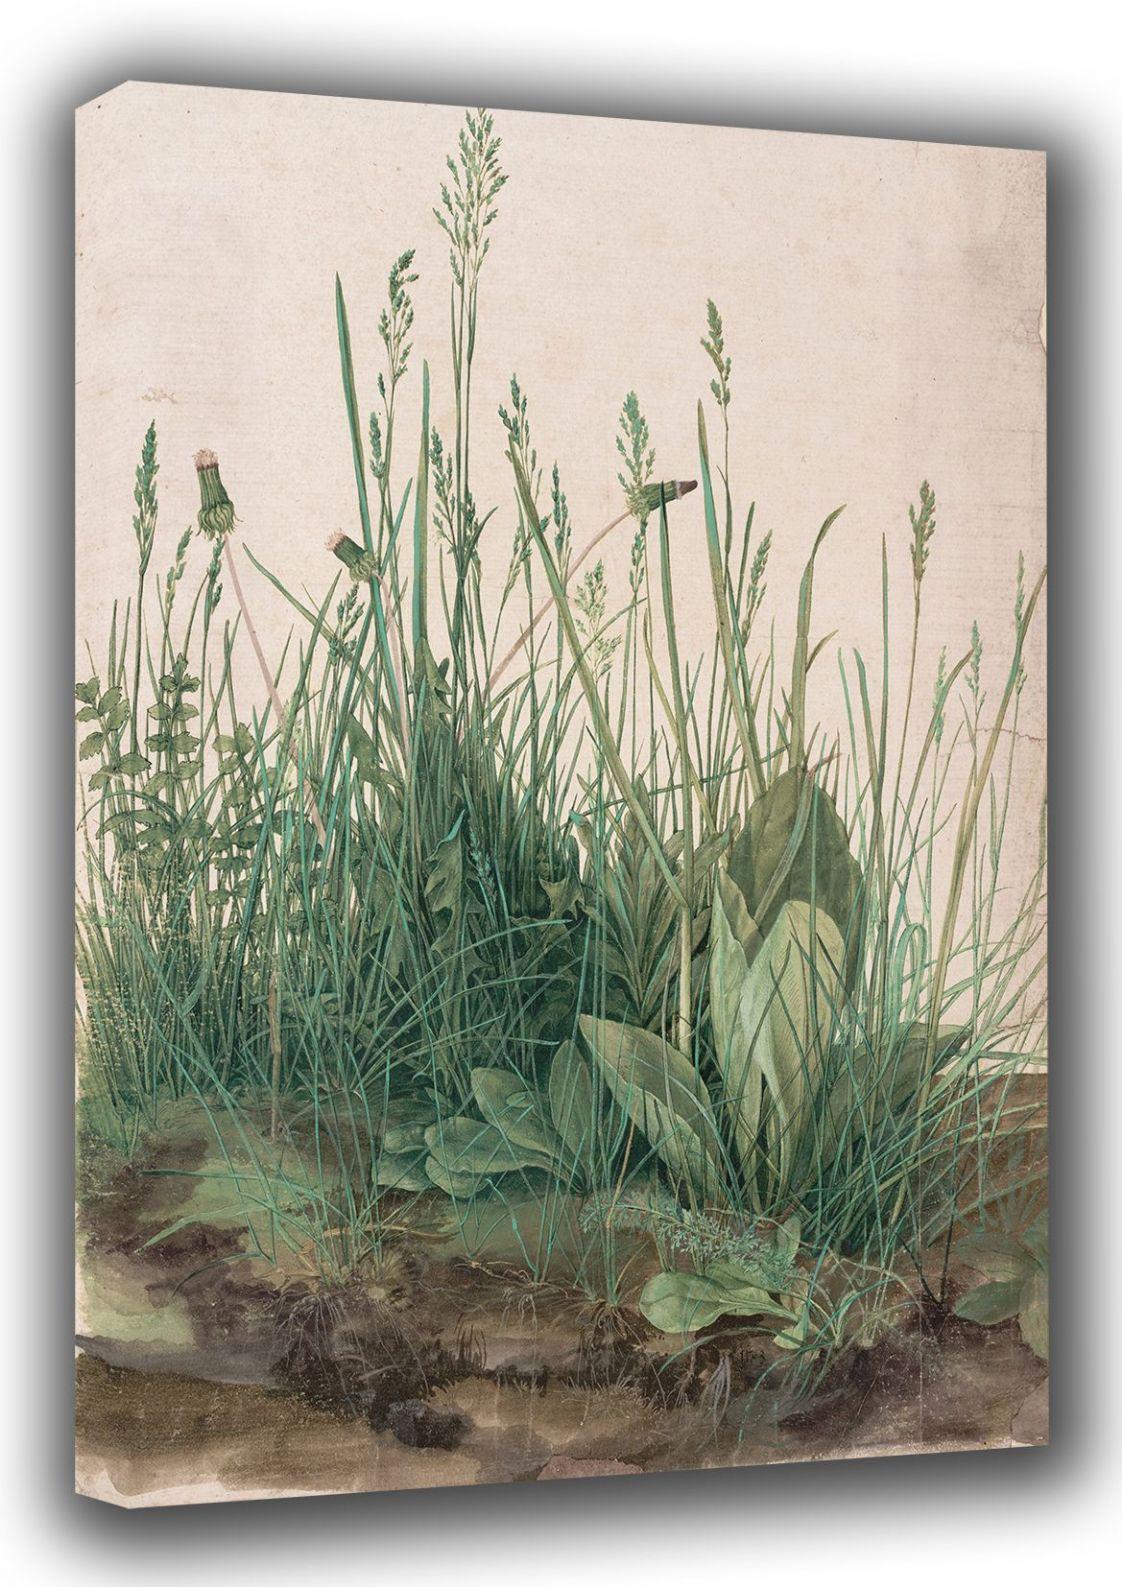 Durer, Albrecht: The Large Turf. (Realism) Botanical Fine Art Canvas. Sizes: A3/A2/A1 (001912)